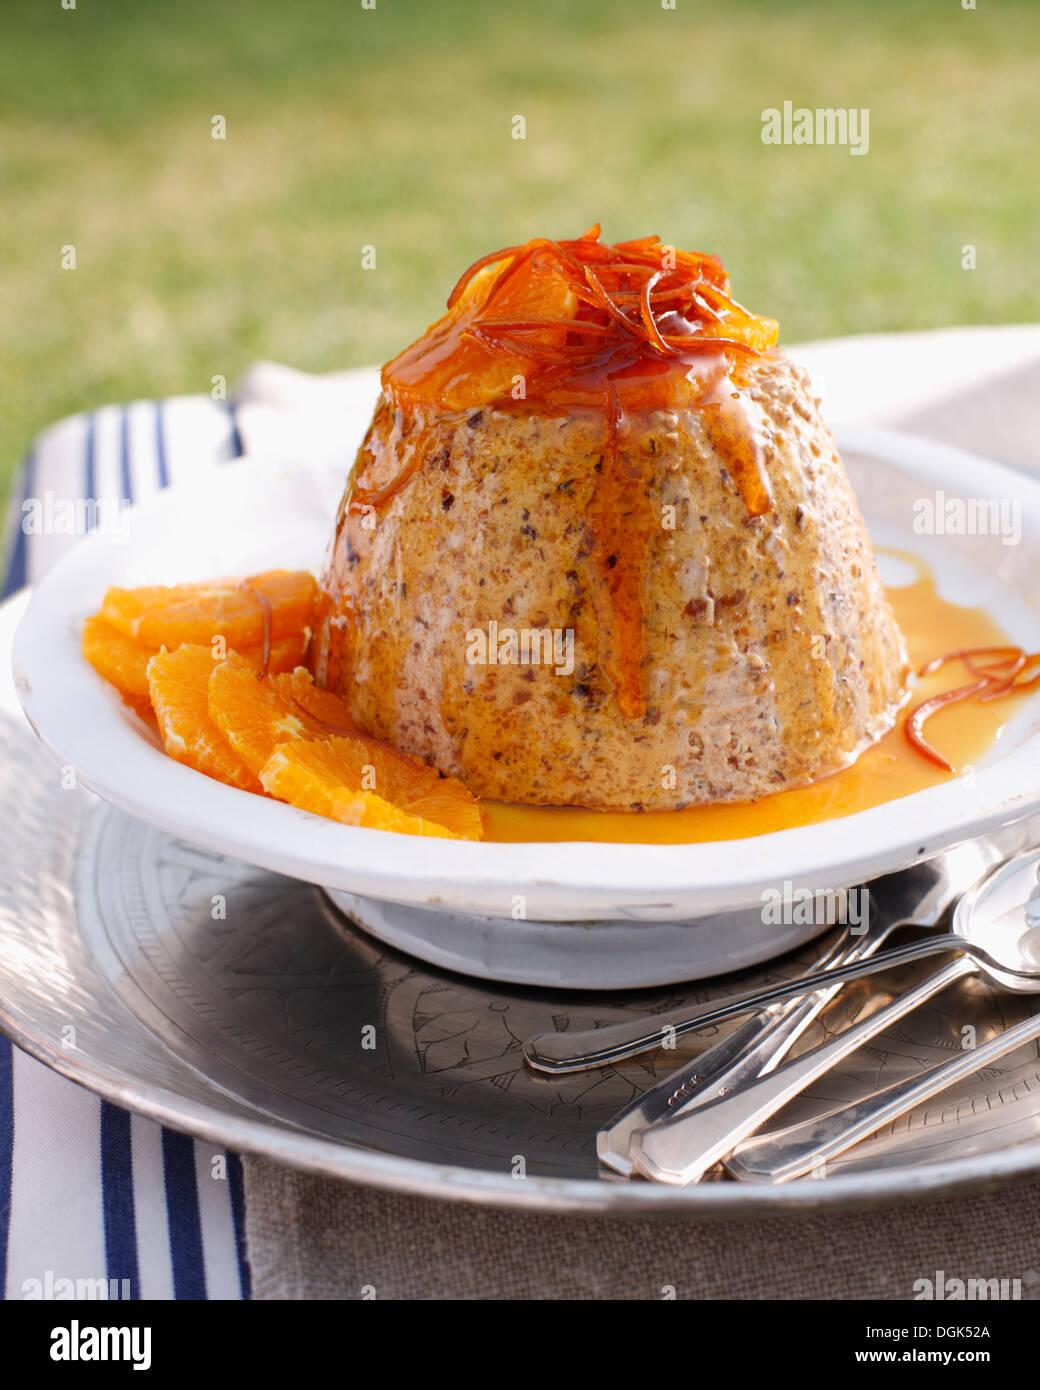 Christmas pudding on garden table in Australian sunlight - Stock Image